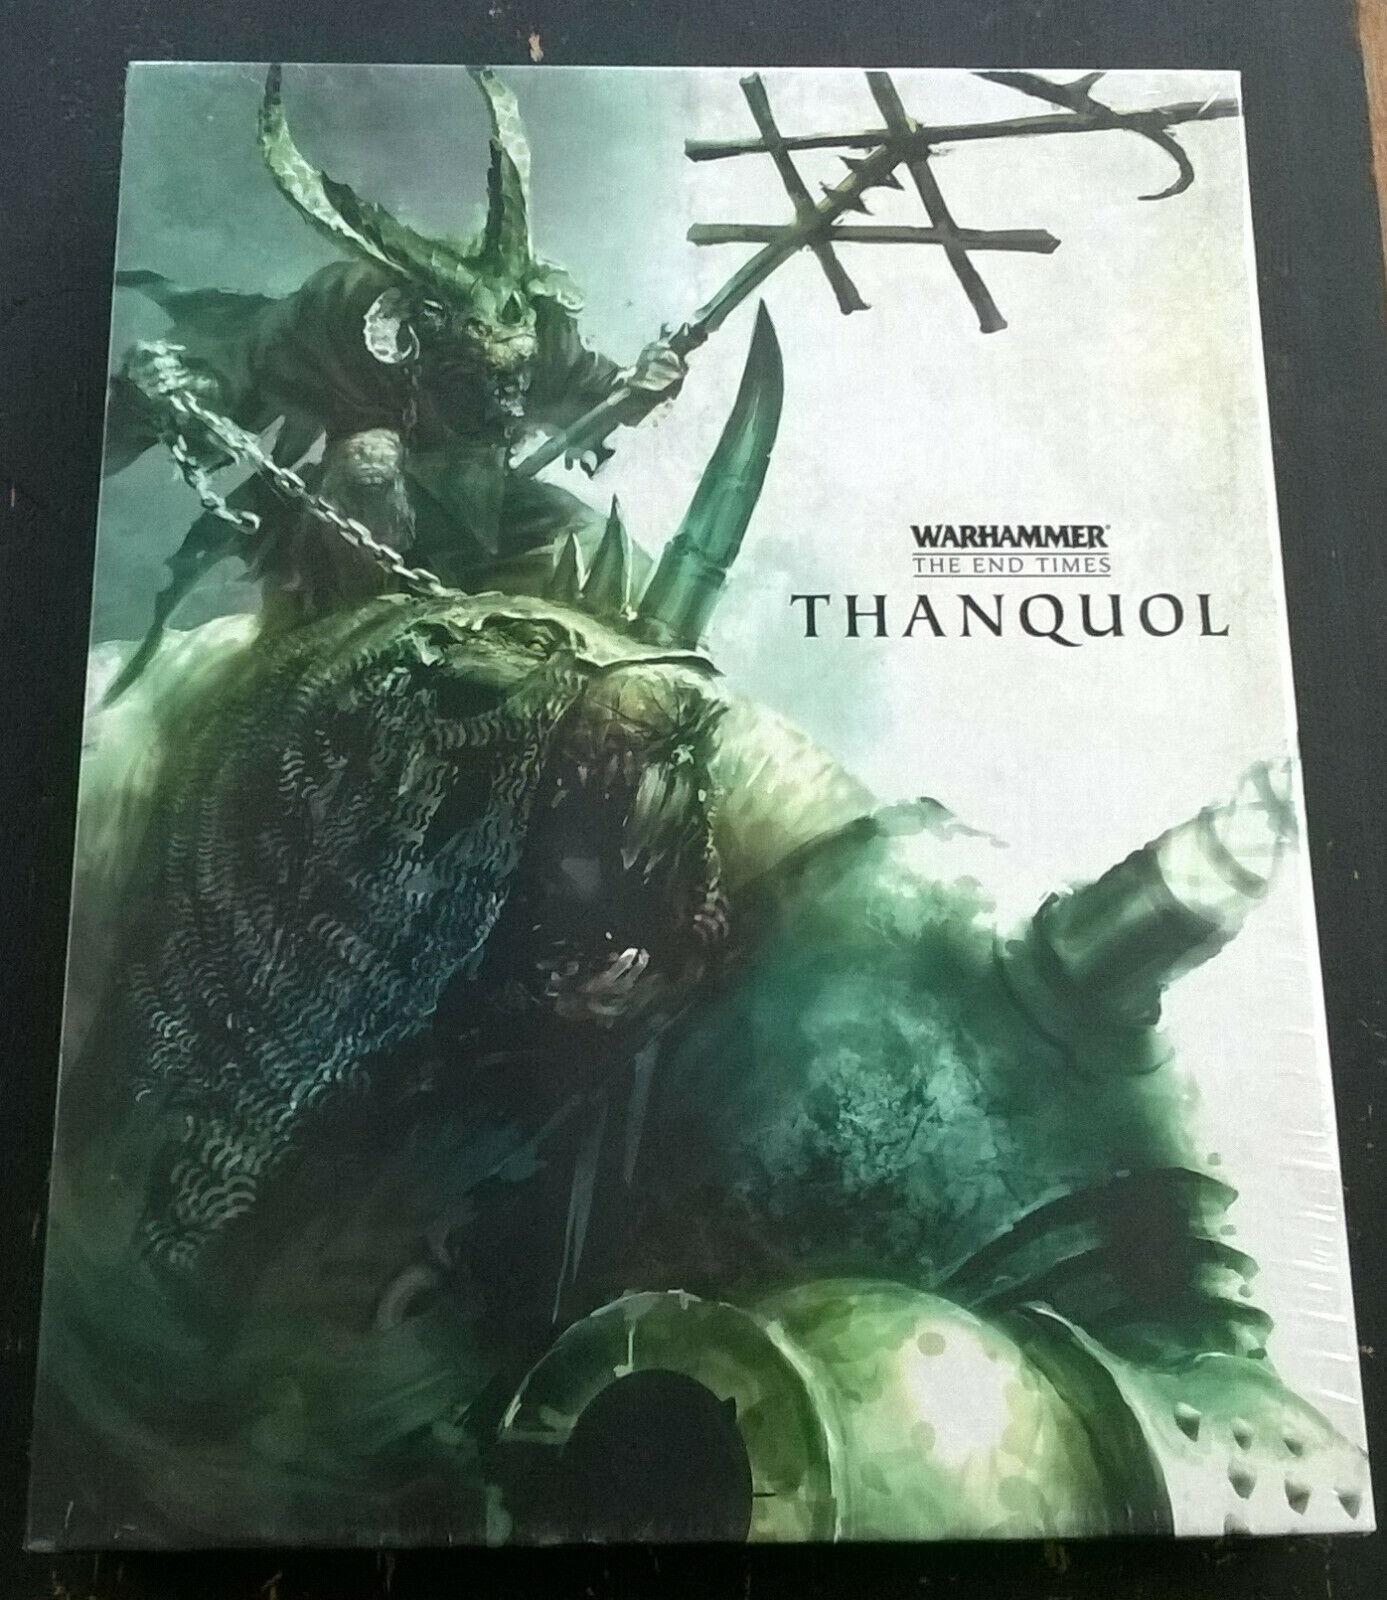 Warhammer The End Times vol 4 THANQUOL - 2 VOL - Juegos Workshop OOP sealed